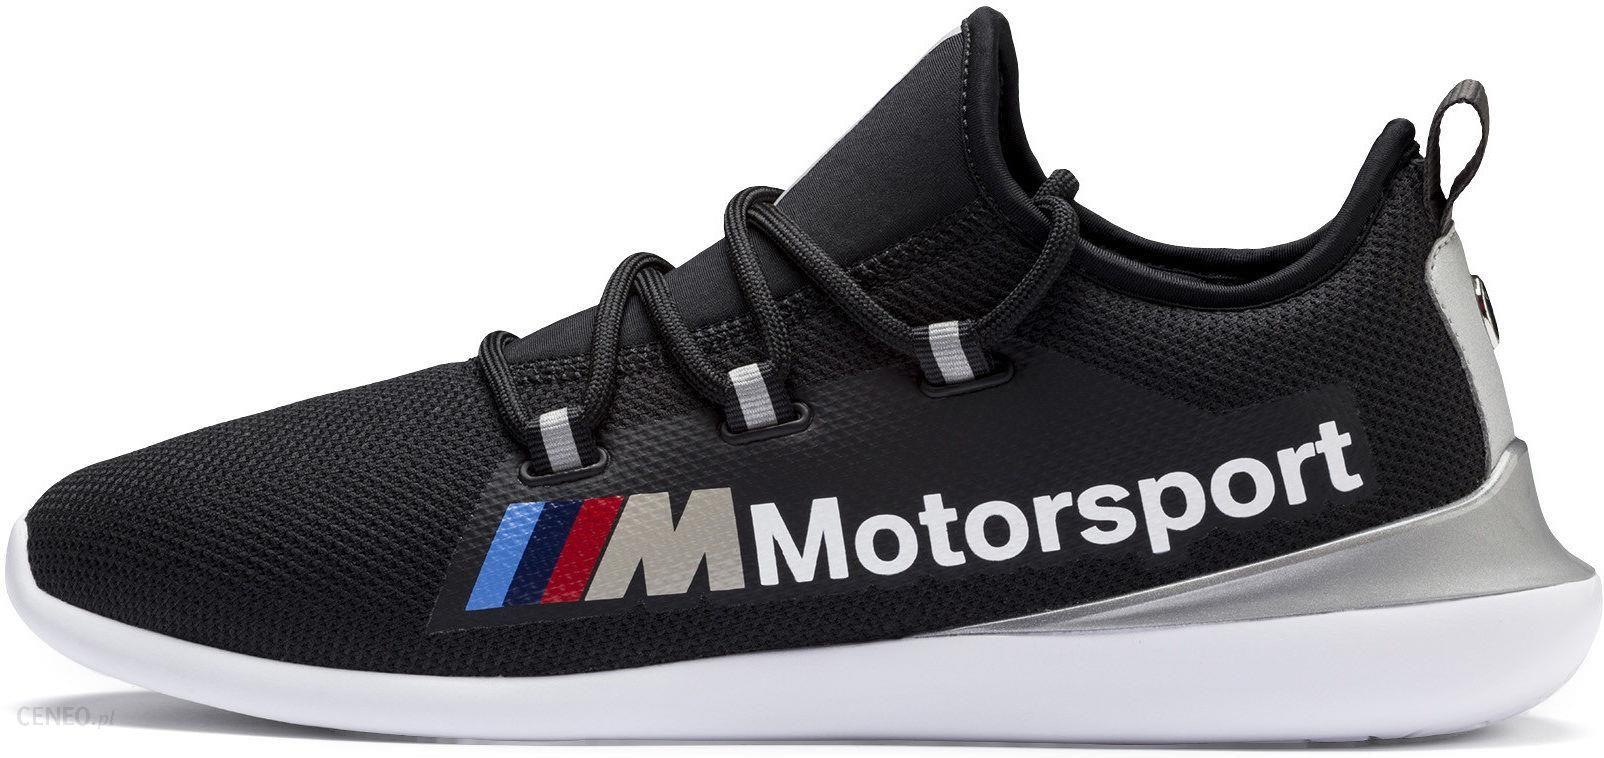 96665691 Buty BMW Motorsport Evo Cat Racer Puma (black-puma silver) - Ceny i ...